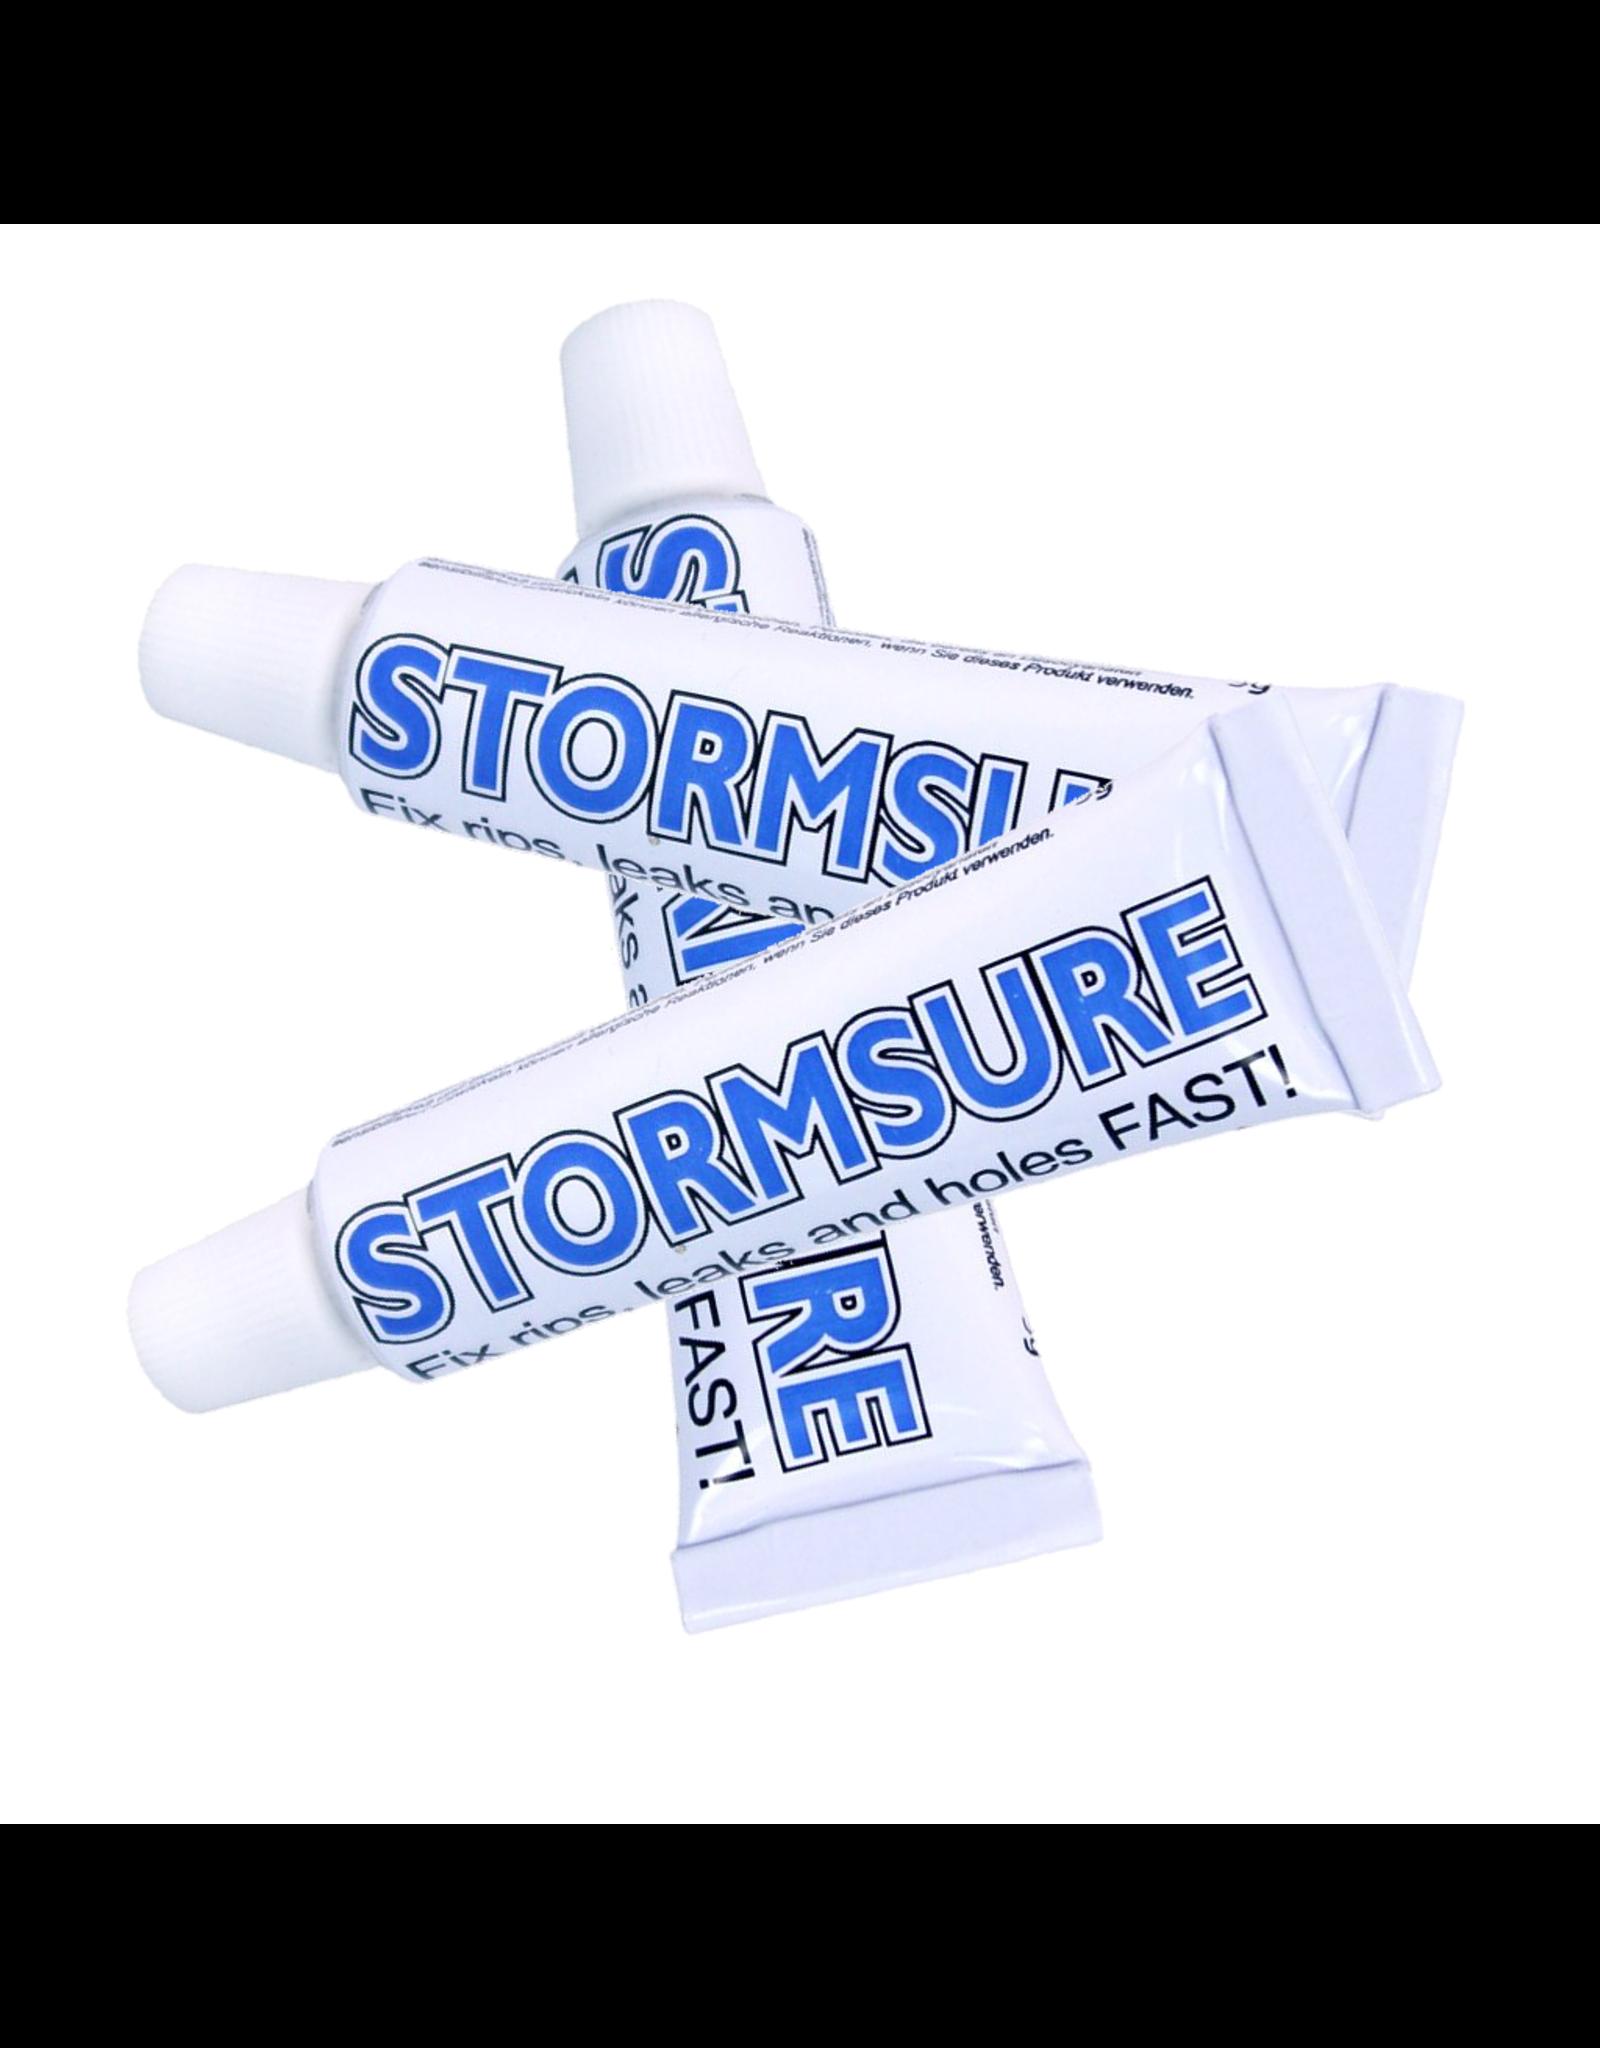 Atlan Stormsure Urethane Glue Tube